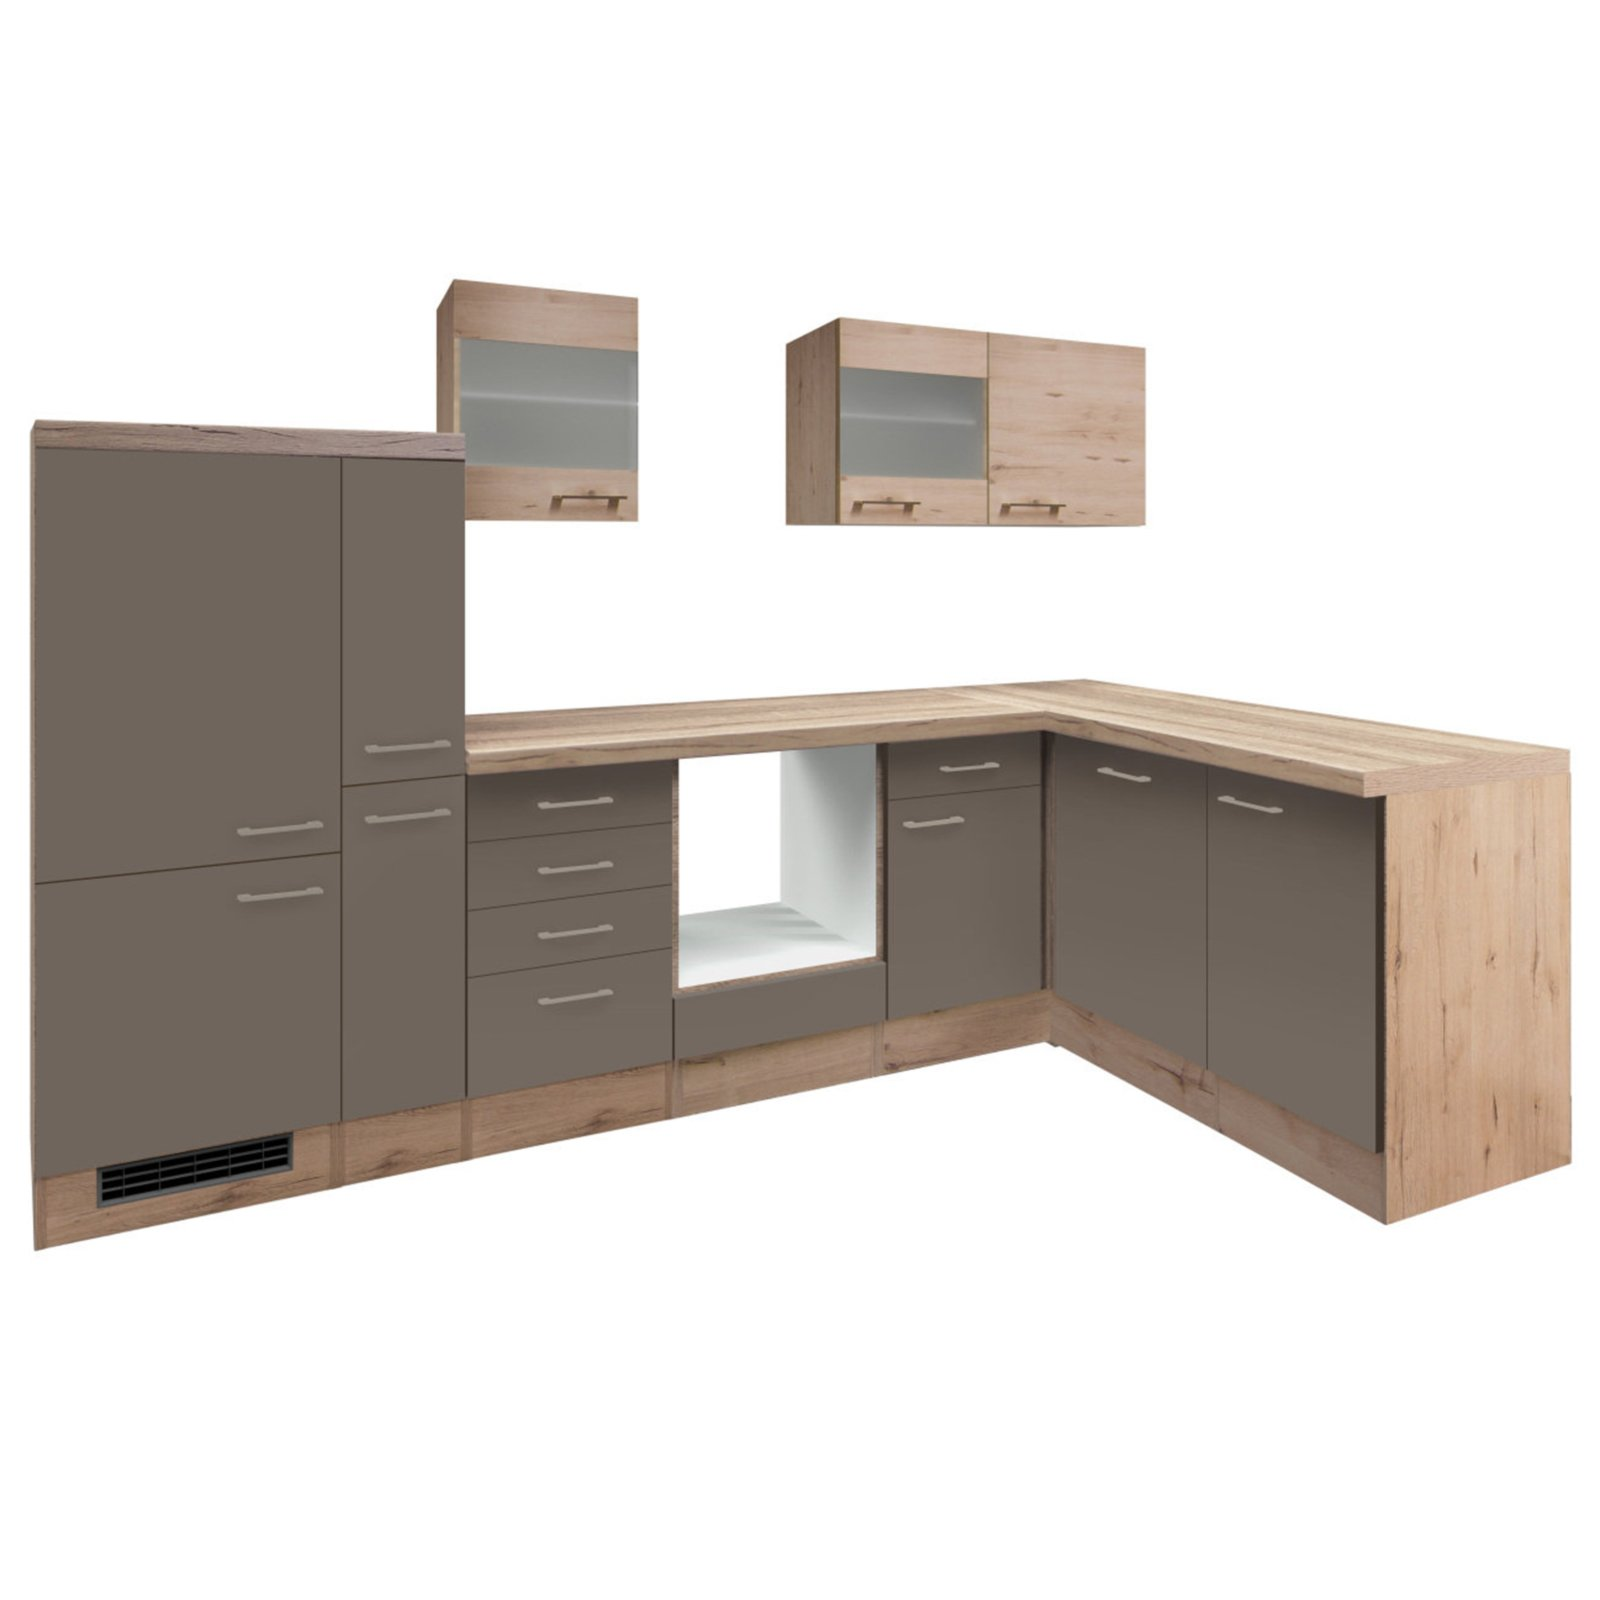 Winkelküche RIVA - Quarz-Cubanit-San Remo - 310x170 cm